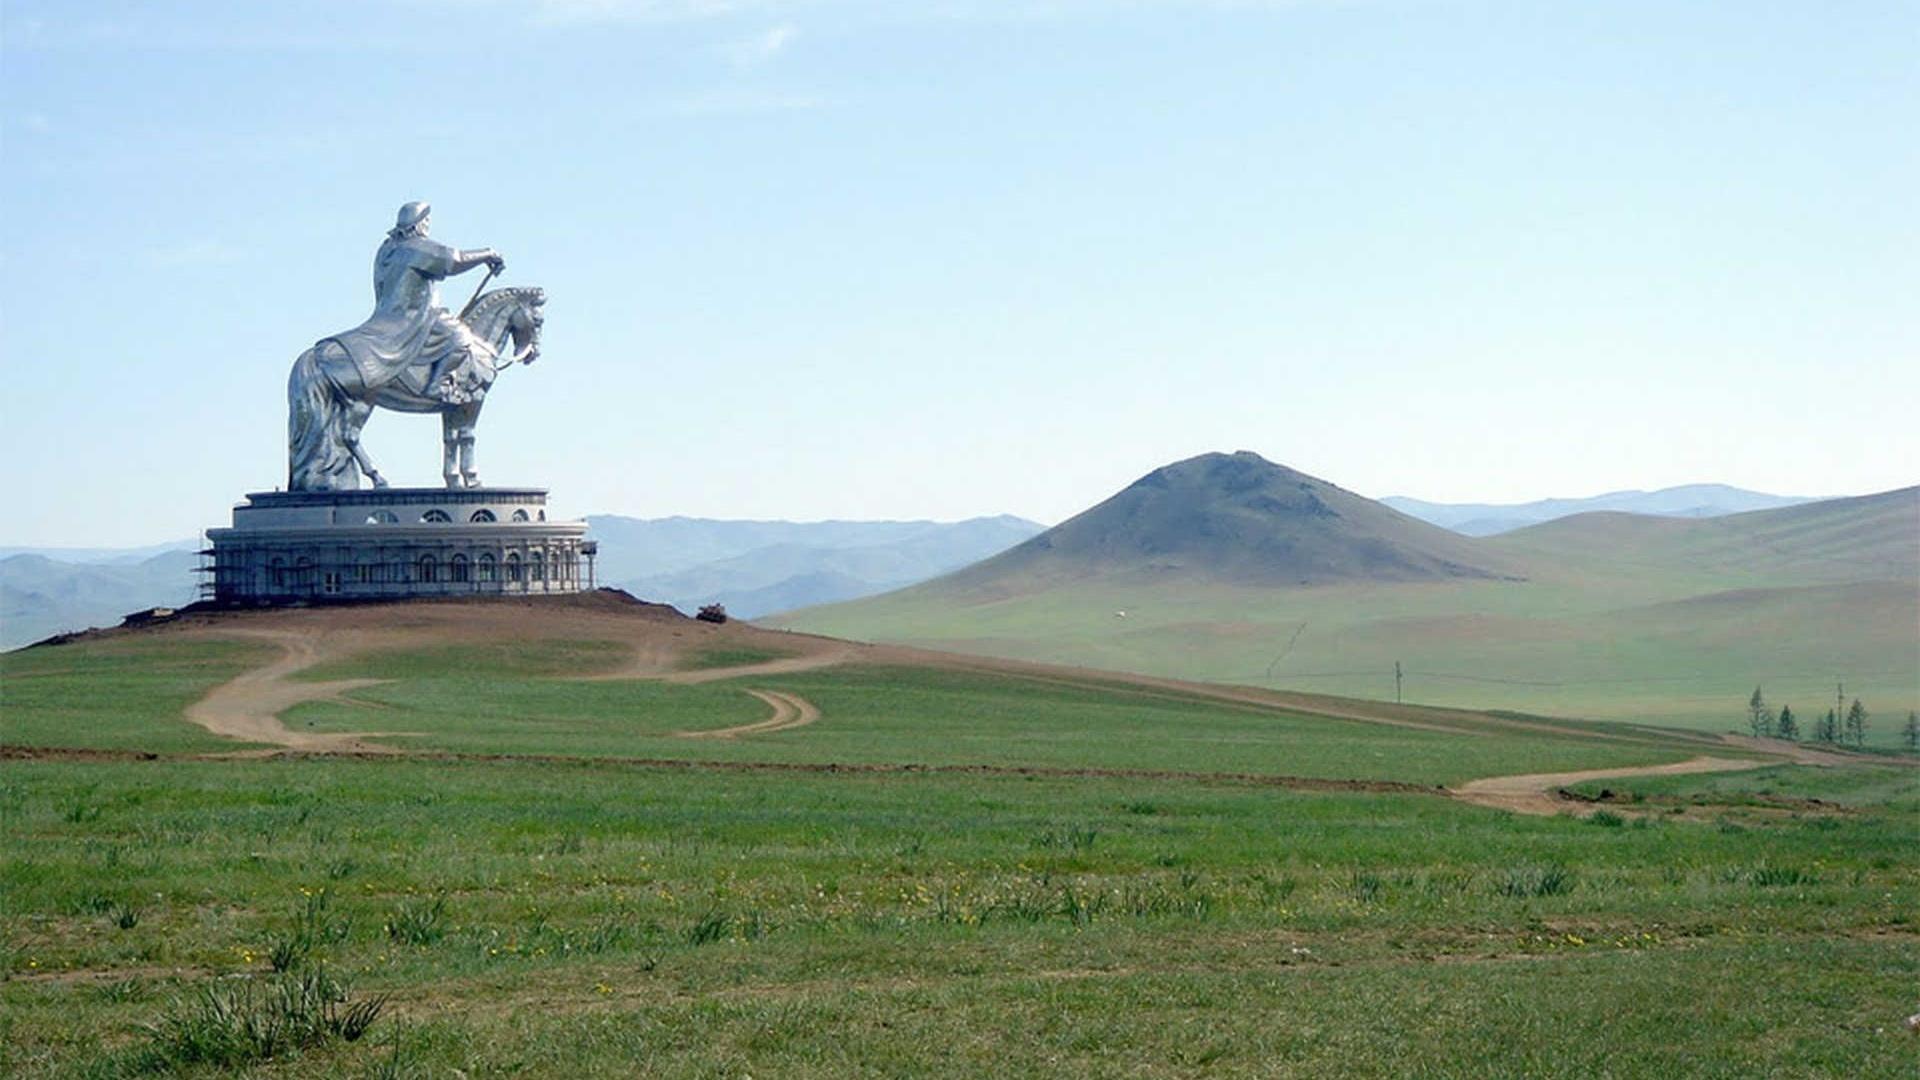 Mongolia Nature hd background